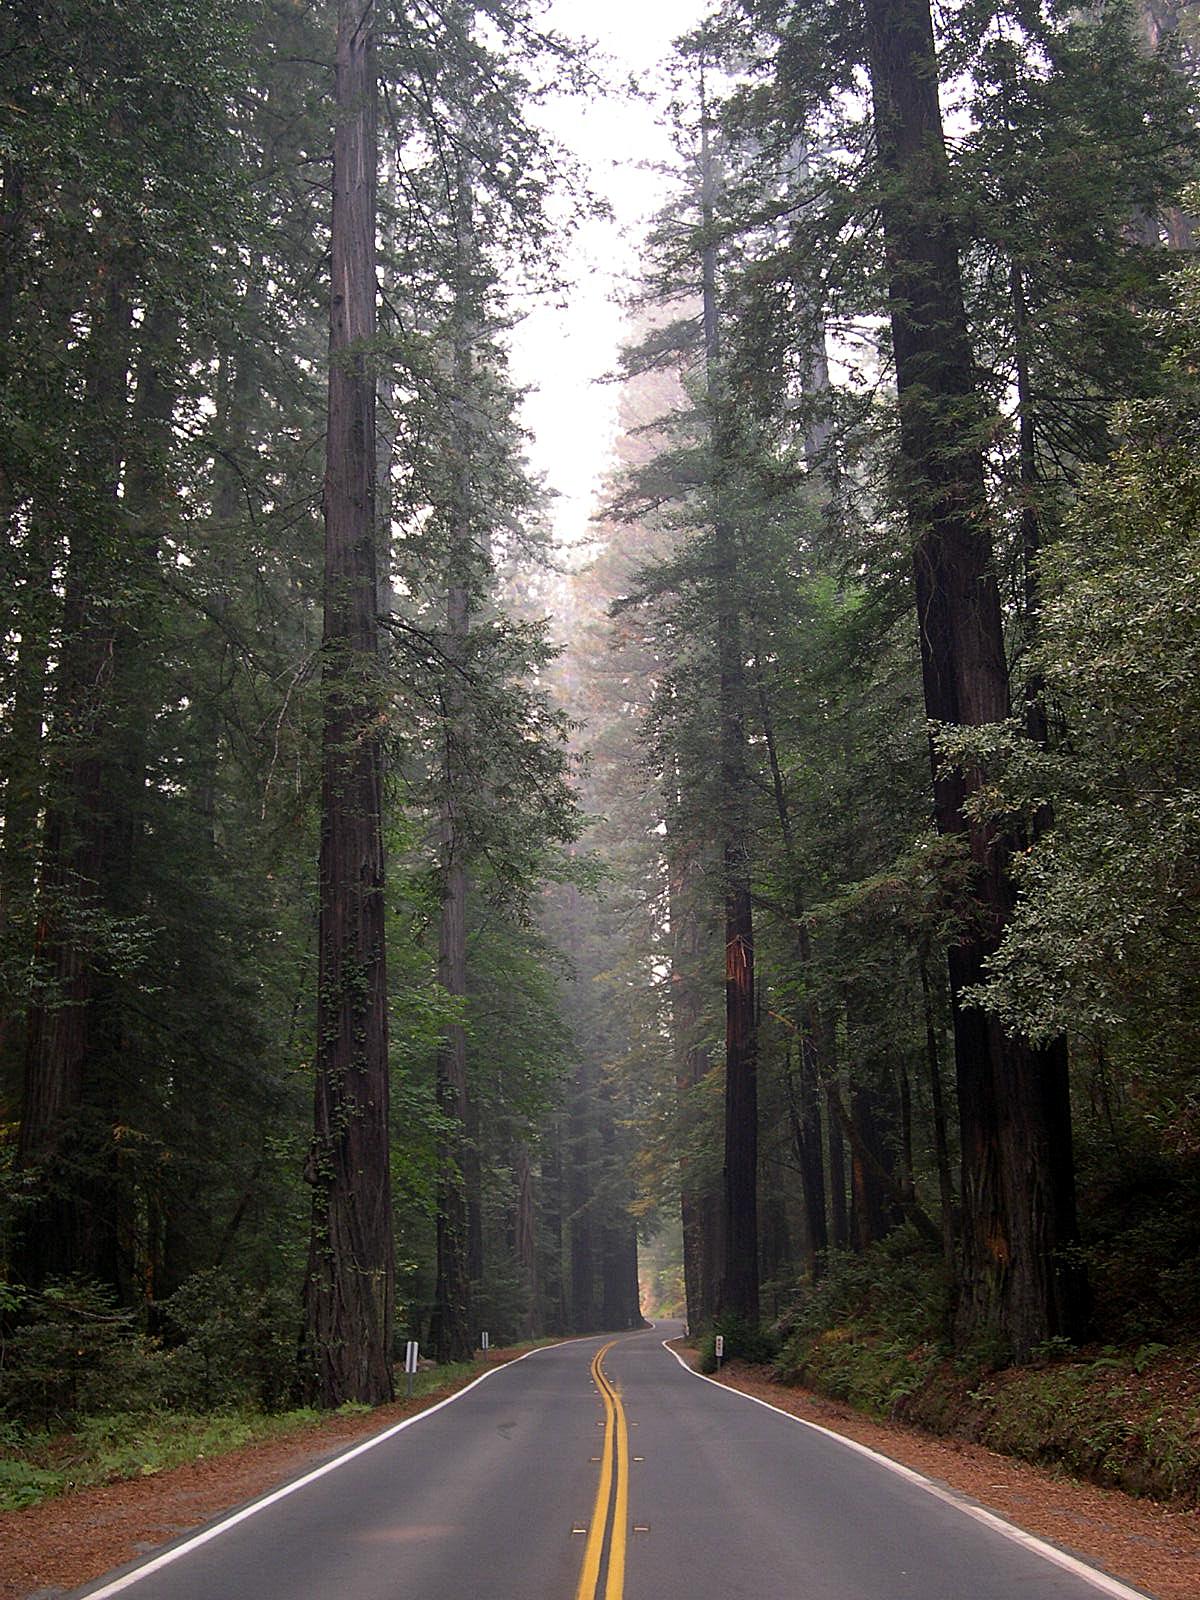 Humboldt Redwoods State Park Wikipedia